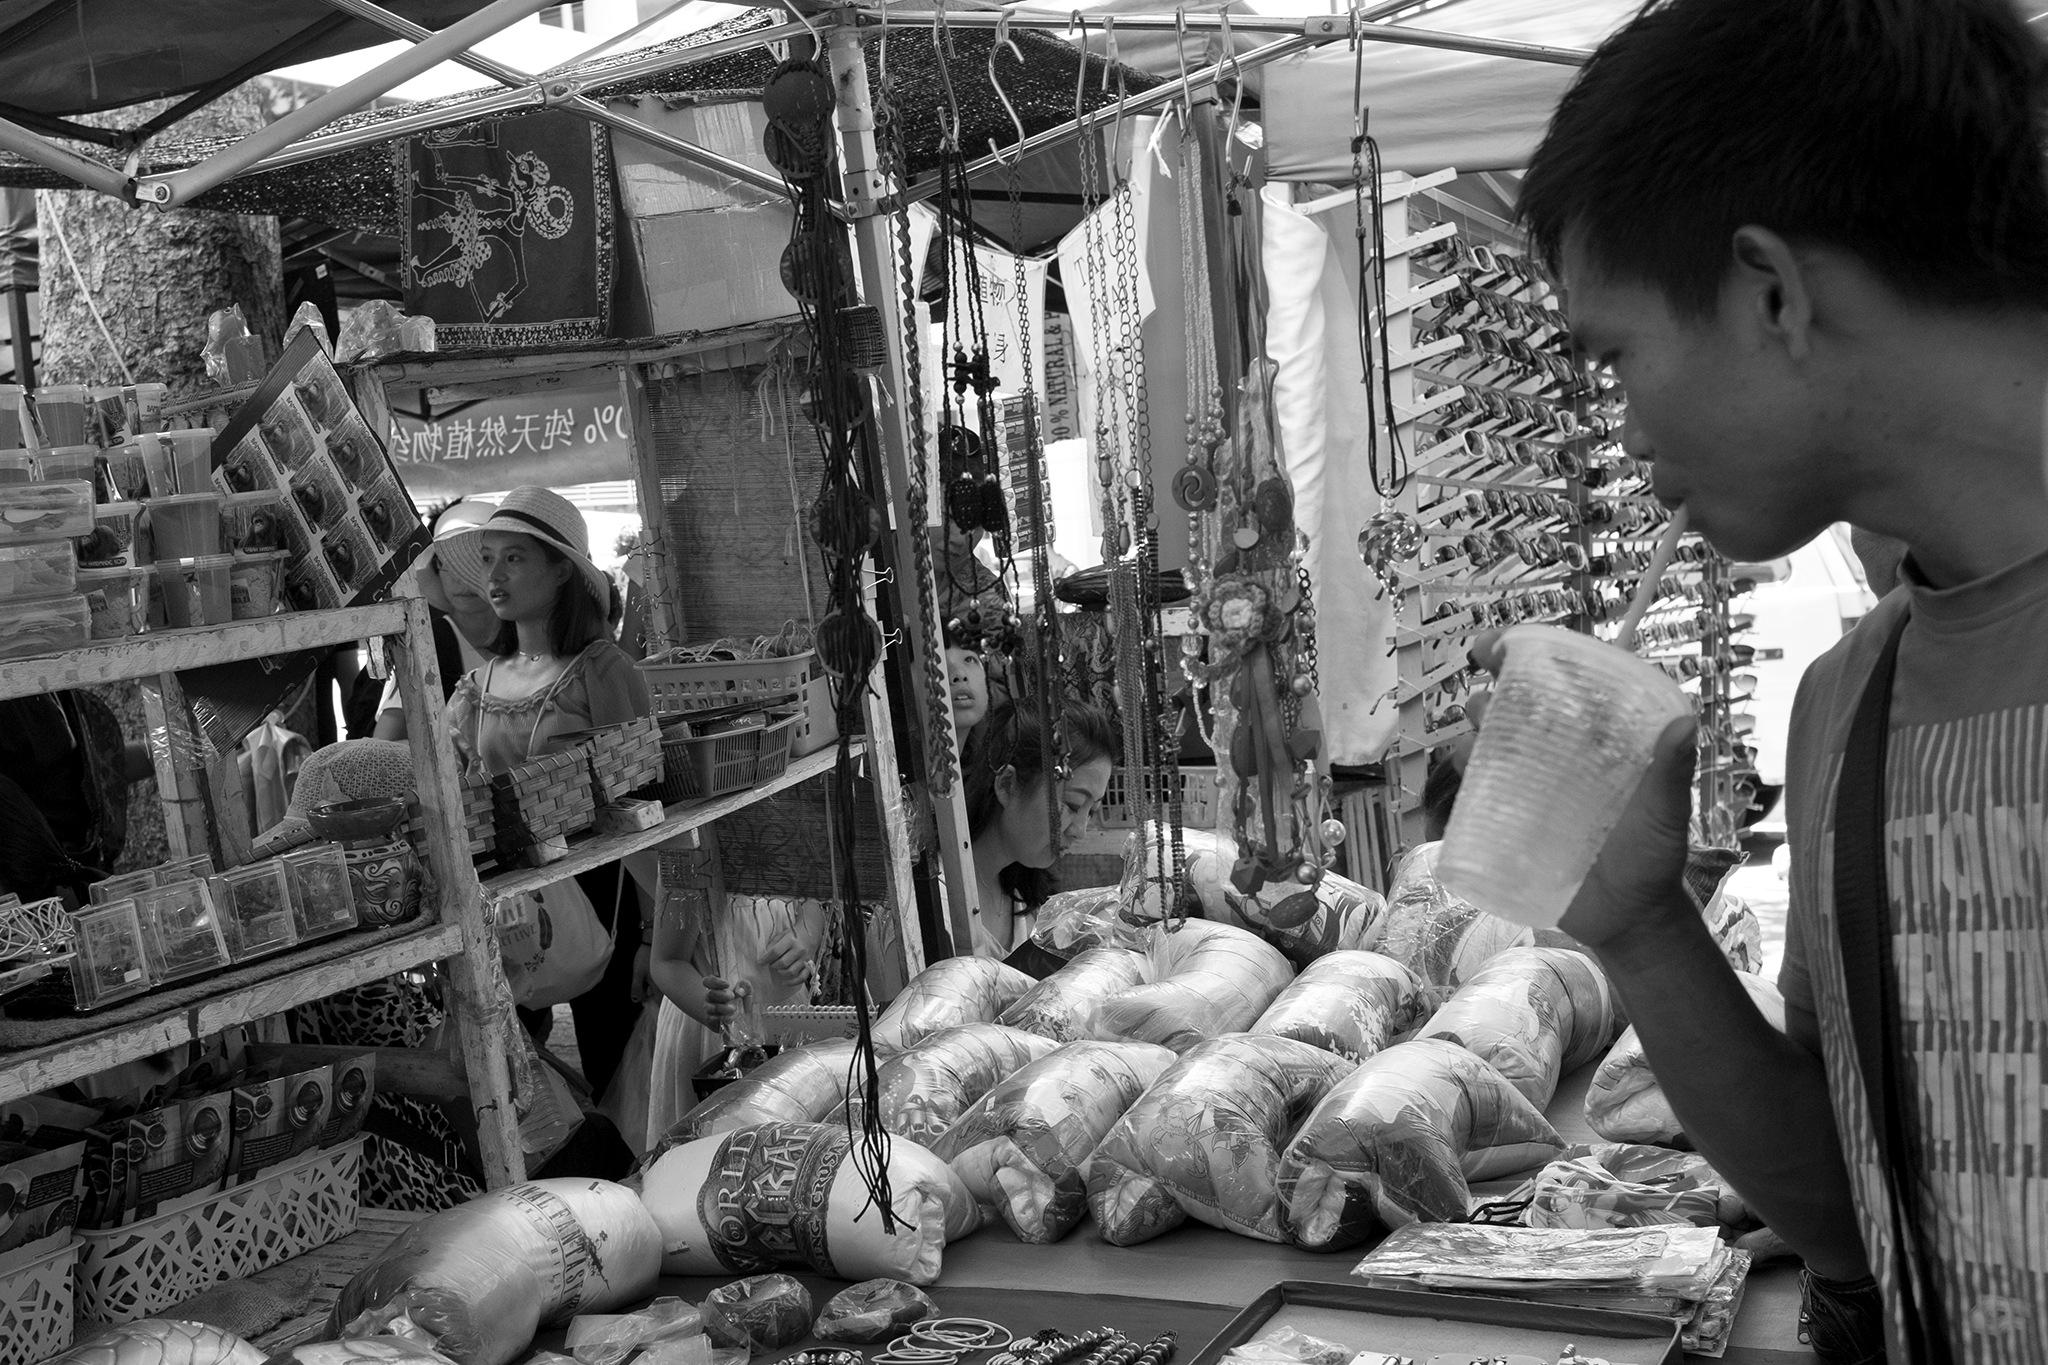 Gaya Street, Kota Kinabalu | 2016 by Yuzie Yusoff